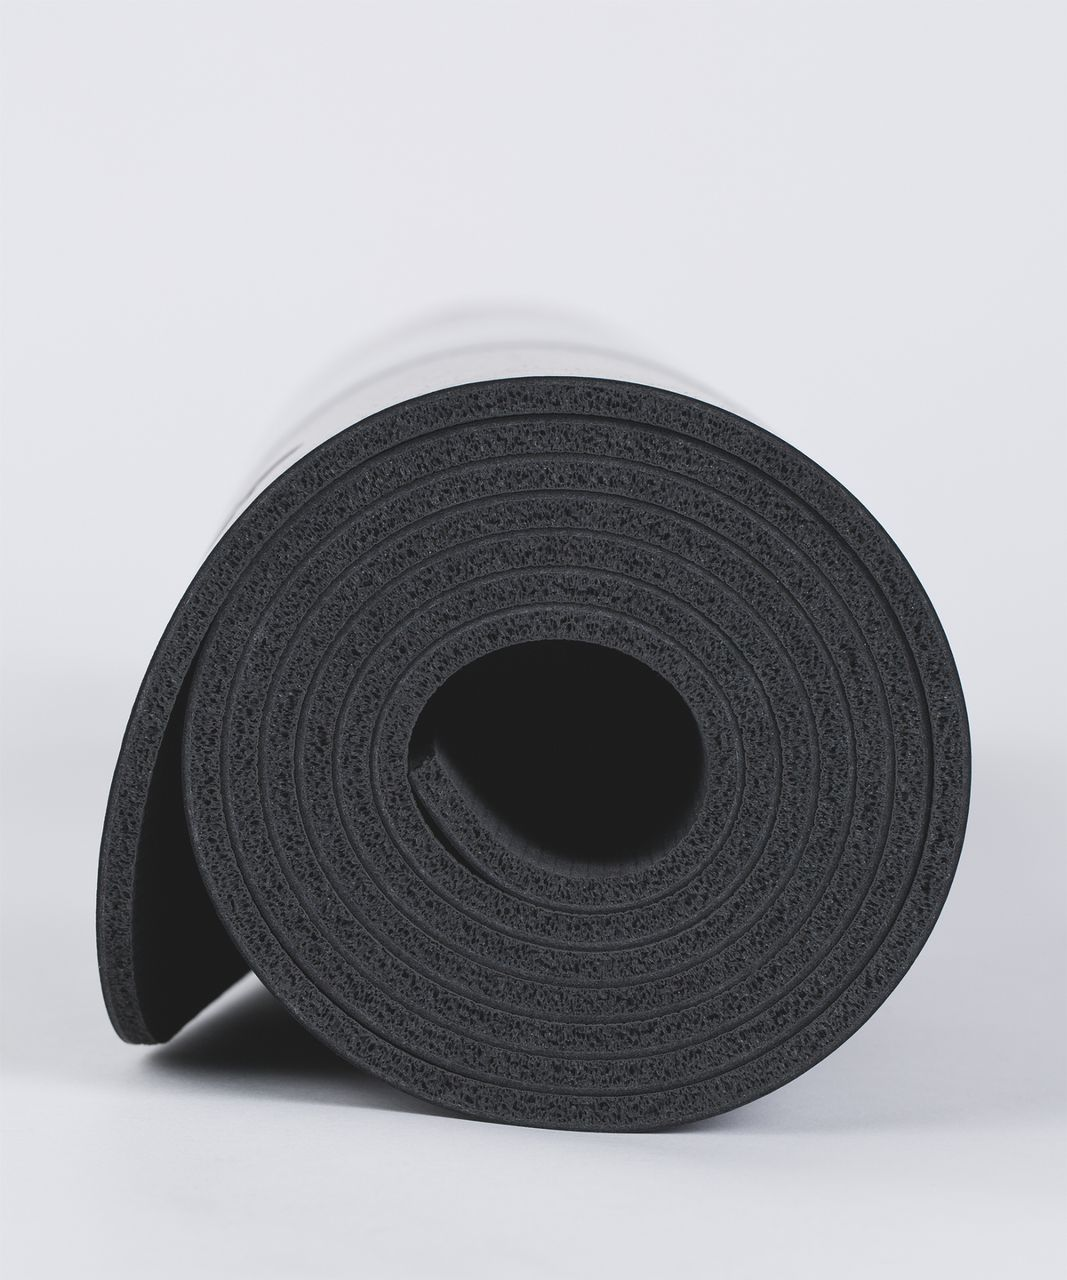 Lululemon The Reversible Mat 5mm - Frozen Fizz Ice Grey Black / Black